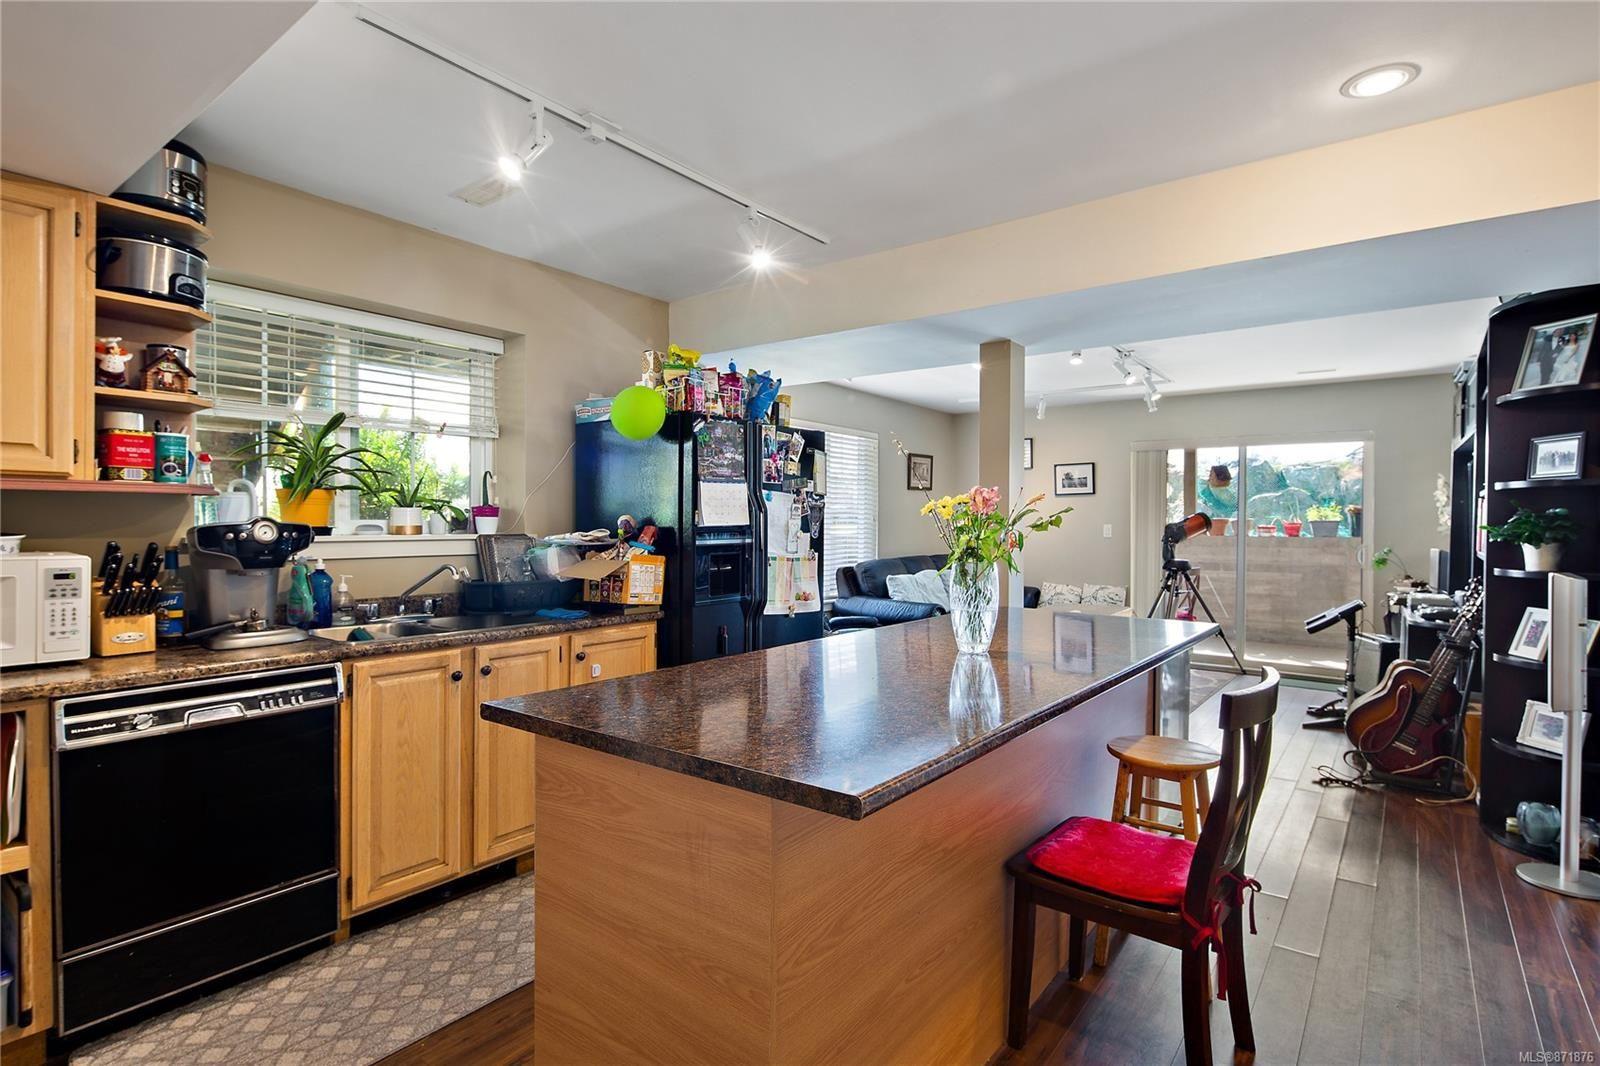 Photo 37: Photos: 4420 Wilkinson Rd in : SW Royal Oak House for sale (Saanich West)  : MLS®# 871876